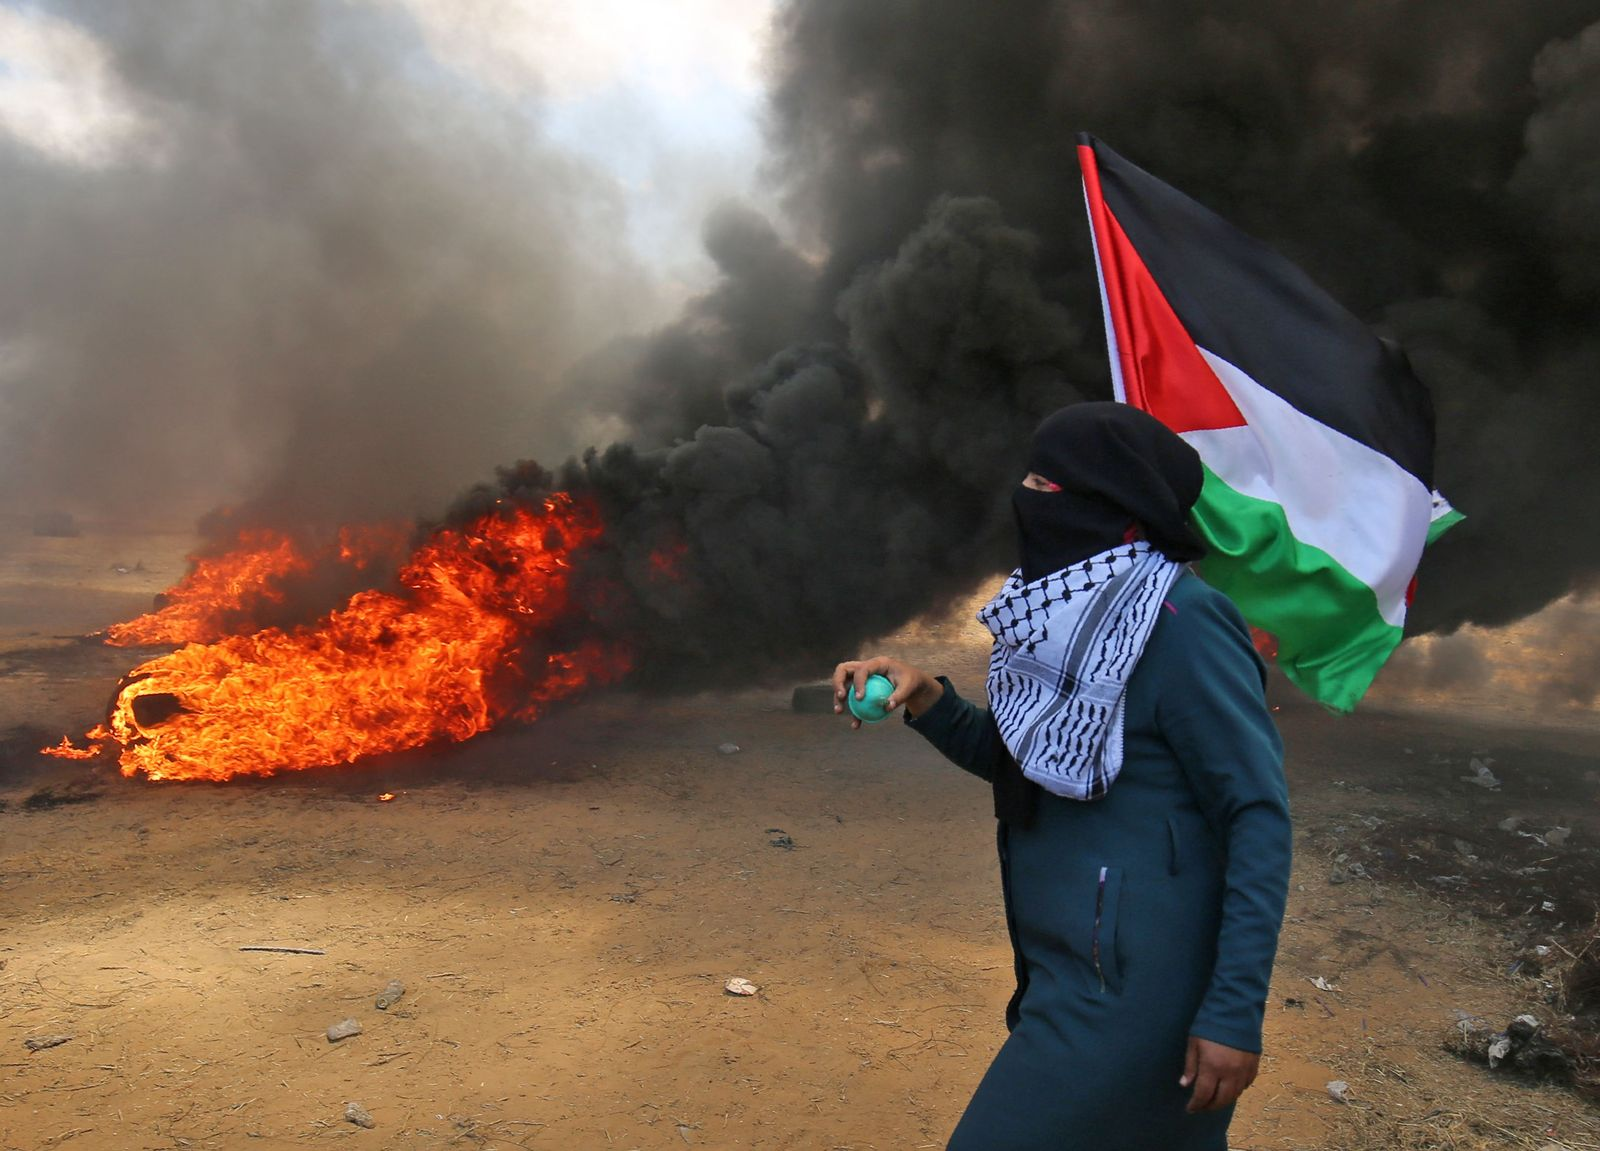 PALESTINIAN-ISRAEL-CONFLICT-US-GAZA